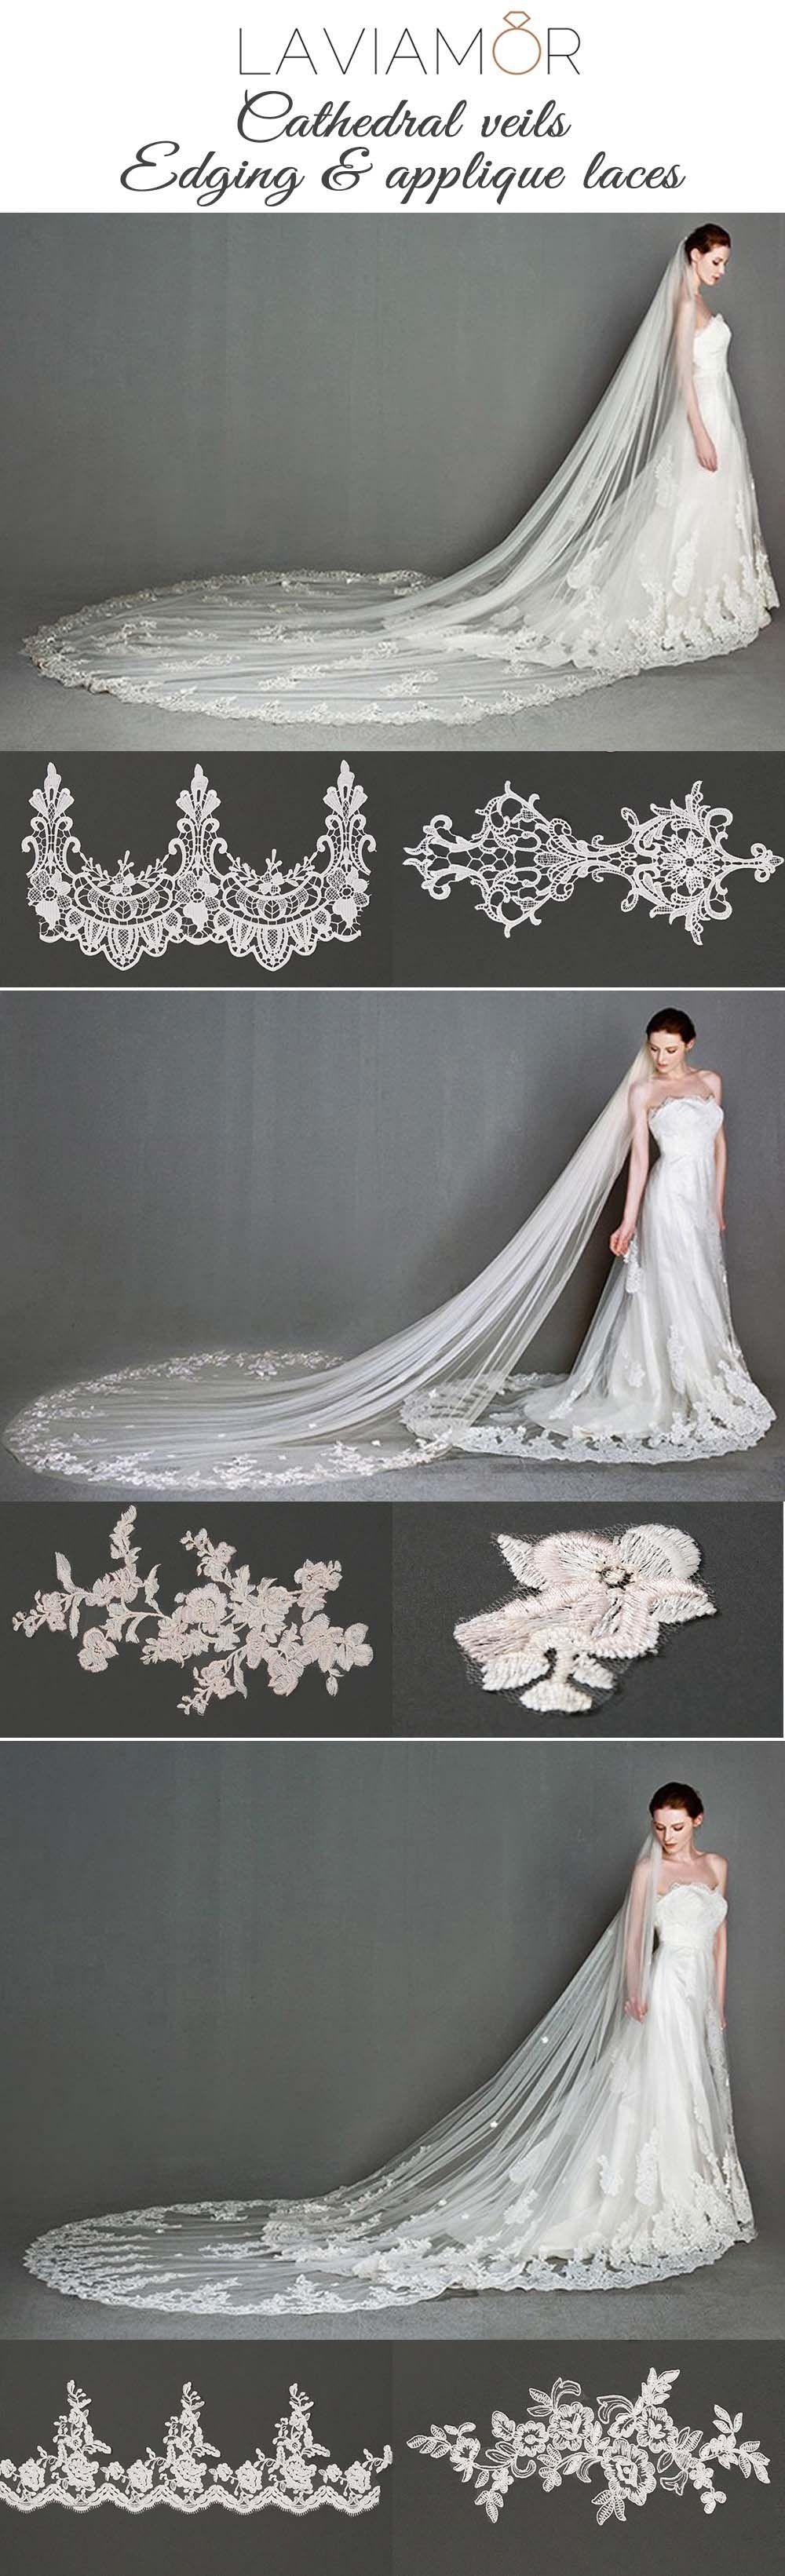 Choose cathedralmantillashort length veil beaded